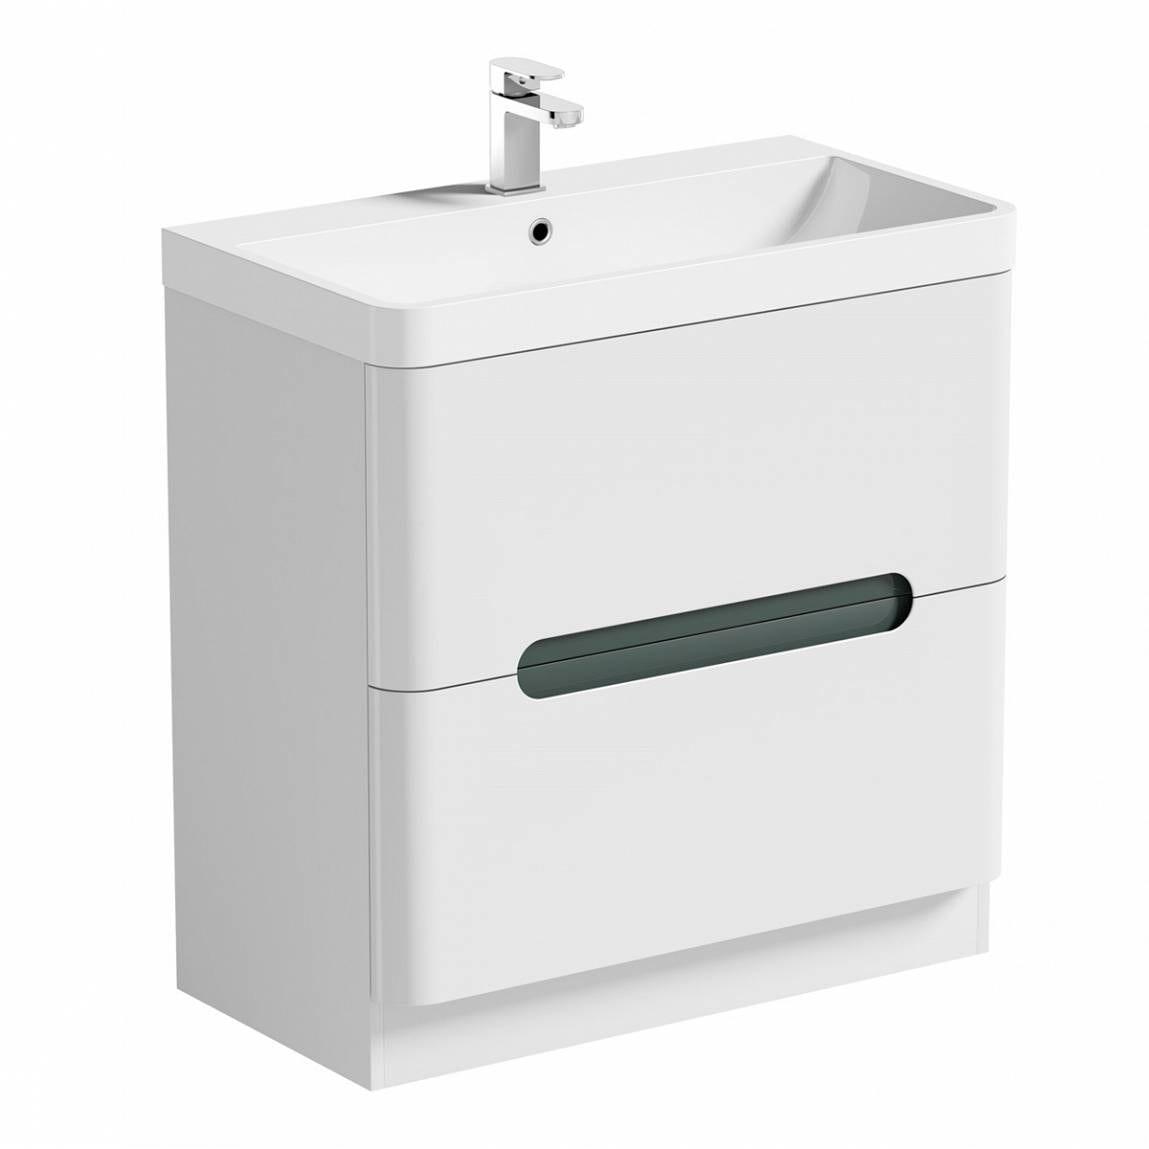 Mode Ellis slate vanity drawer unit and basin 800mm